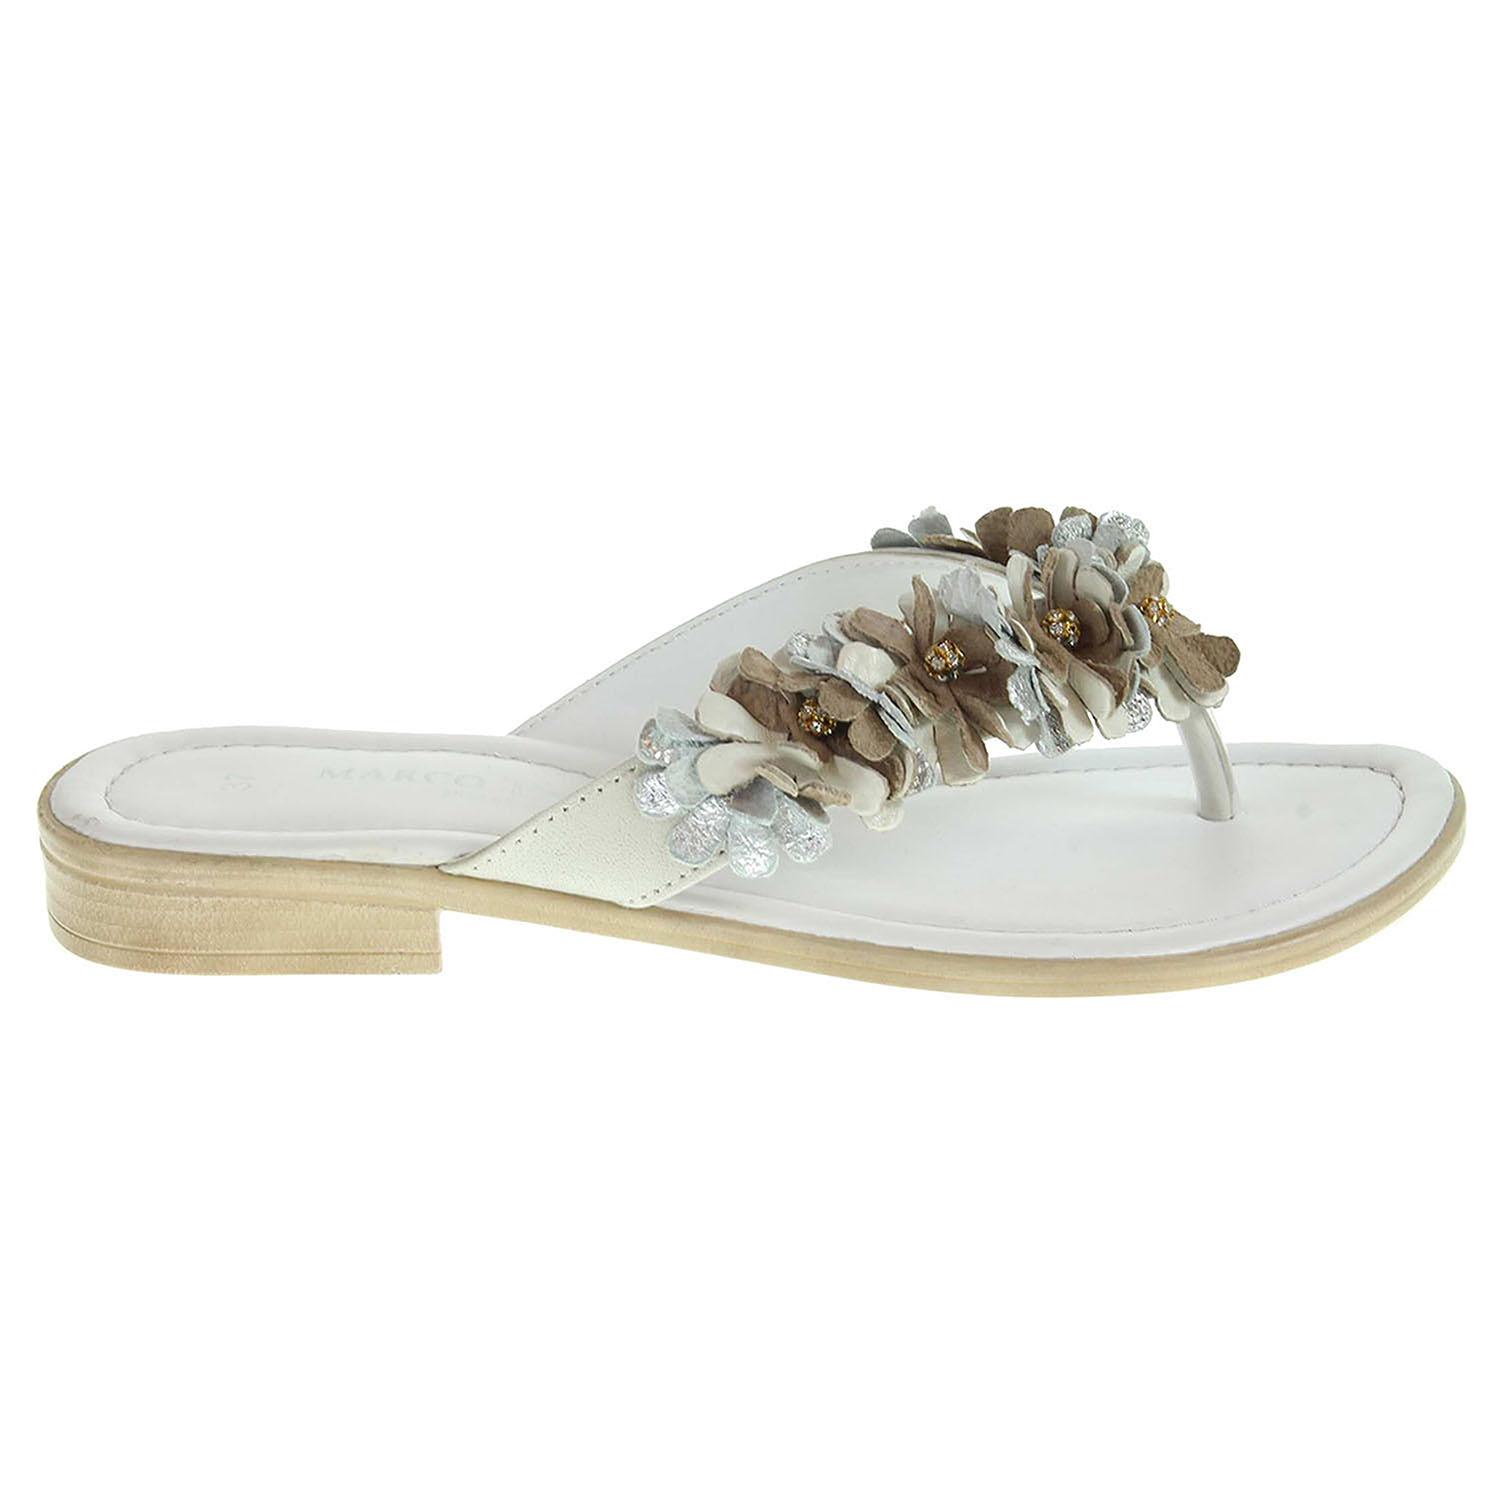 Ecco Marco Tozzi dámské pantofle 2-27107-26 bílé 23600725